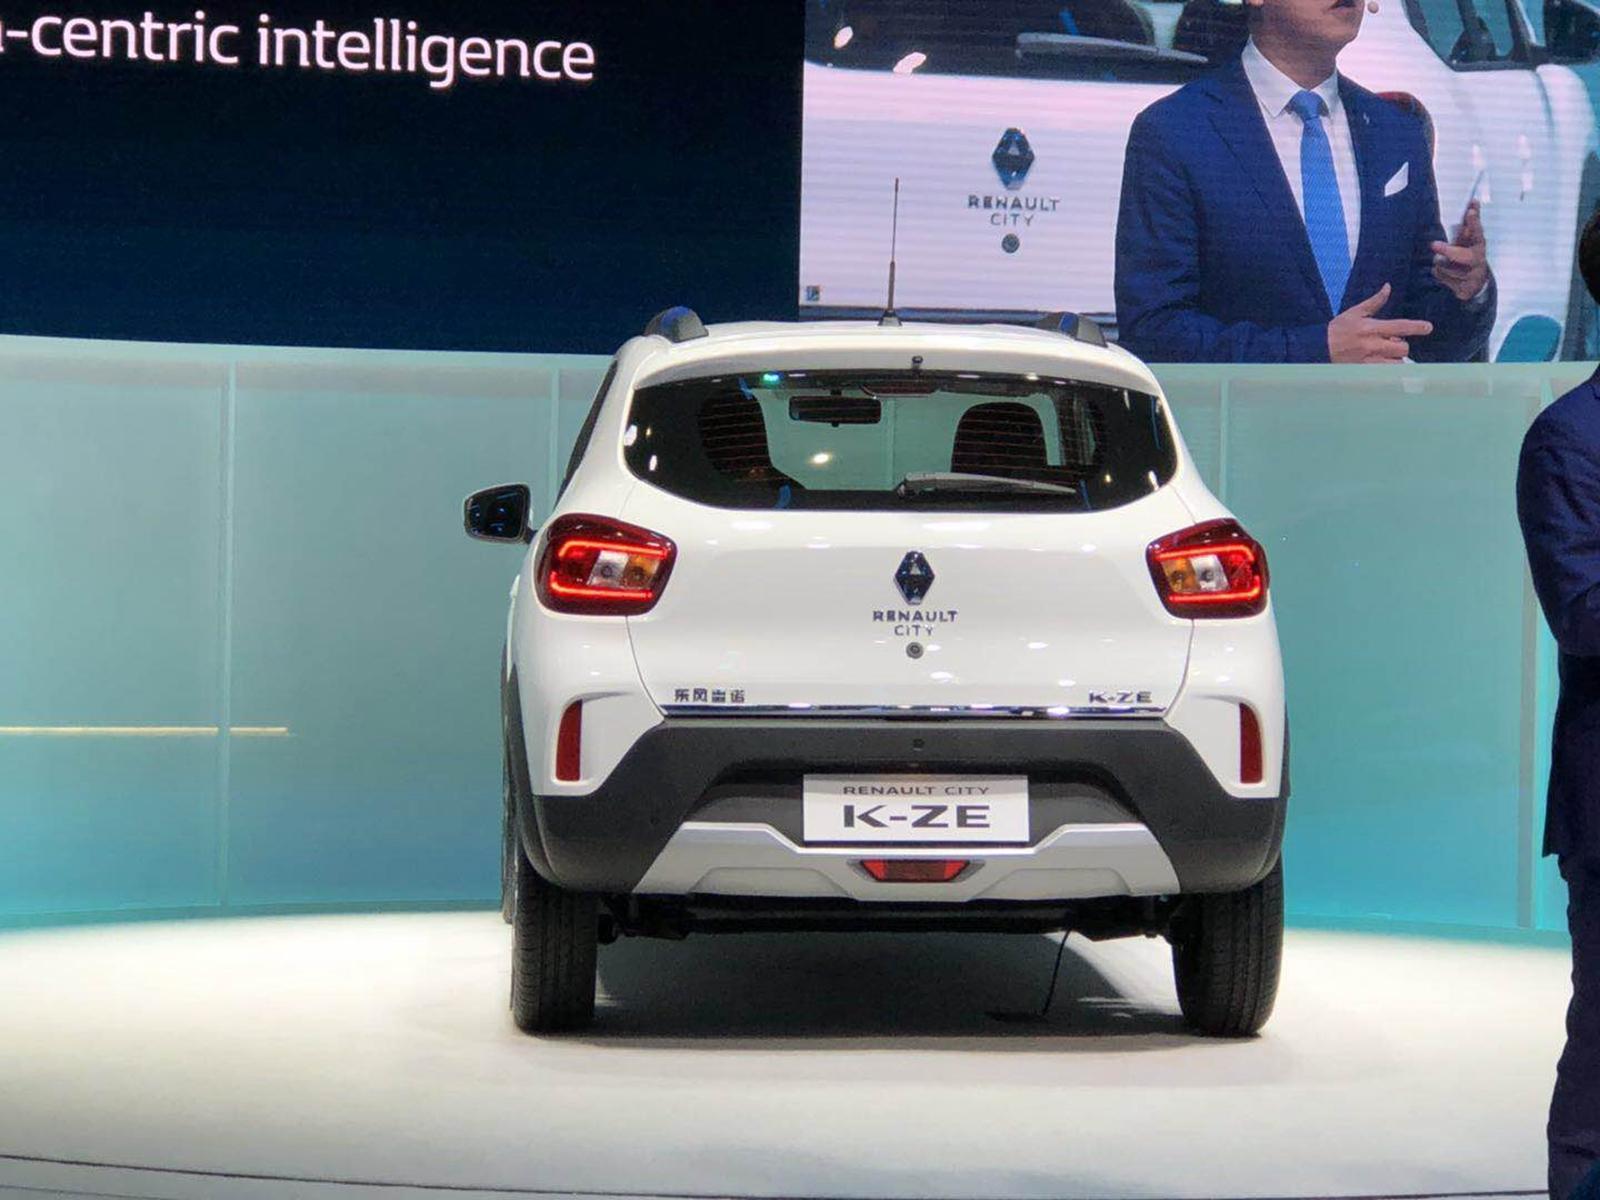 2015 - [Renault] Kwid [BBA] (Inde) [BBB] (Brésil) - Page 32 198fe768c22b42d68ec6123f4fb8063a